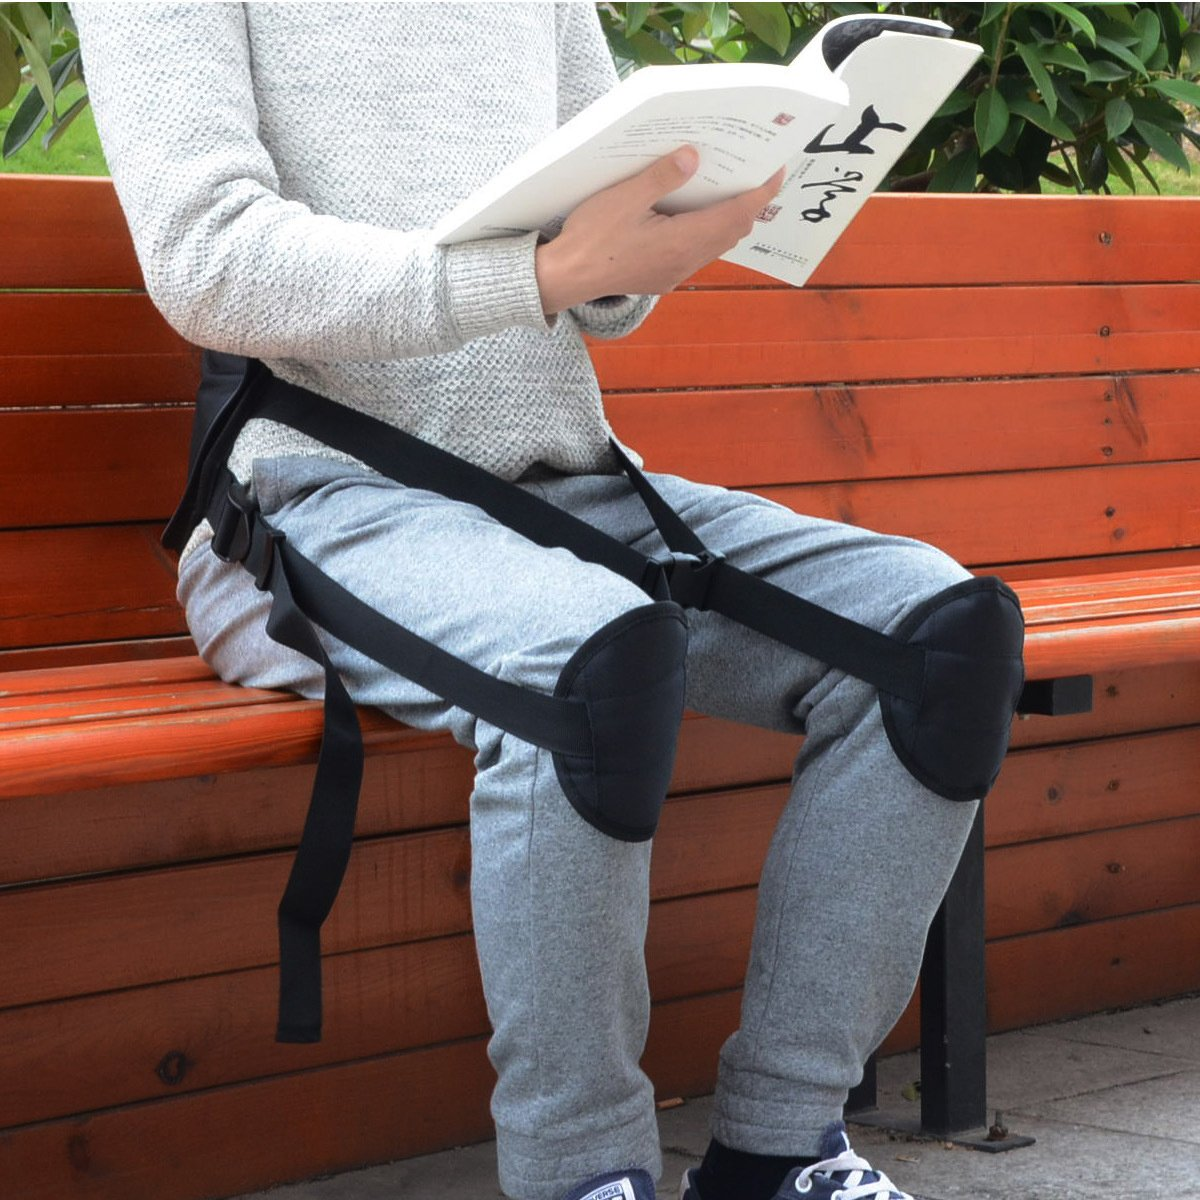 Ueasy Adjustable Back Posture Corrector Brace Clavicle Brace Portable Correct Back Posture for Correction Posture Enhance Temperament by Ueasy (Image #1)